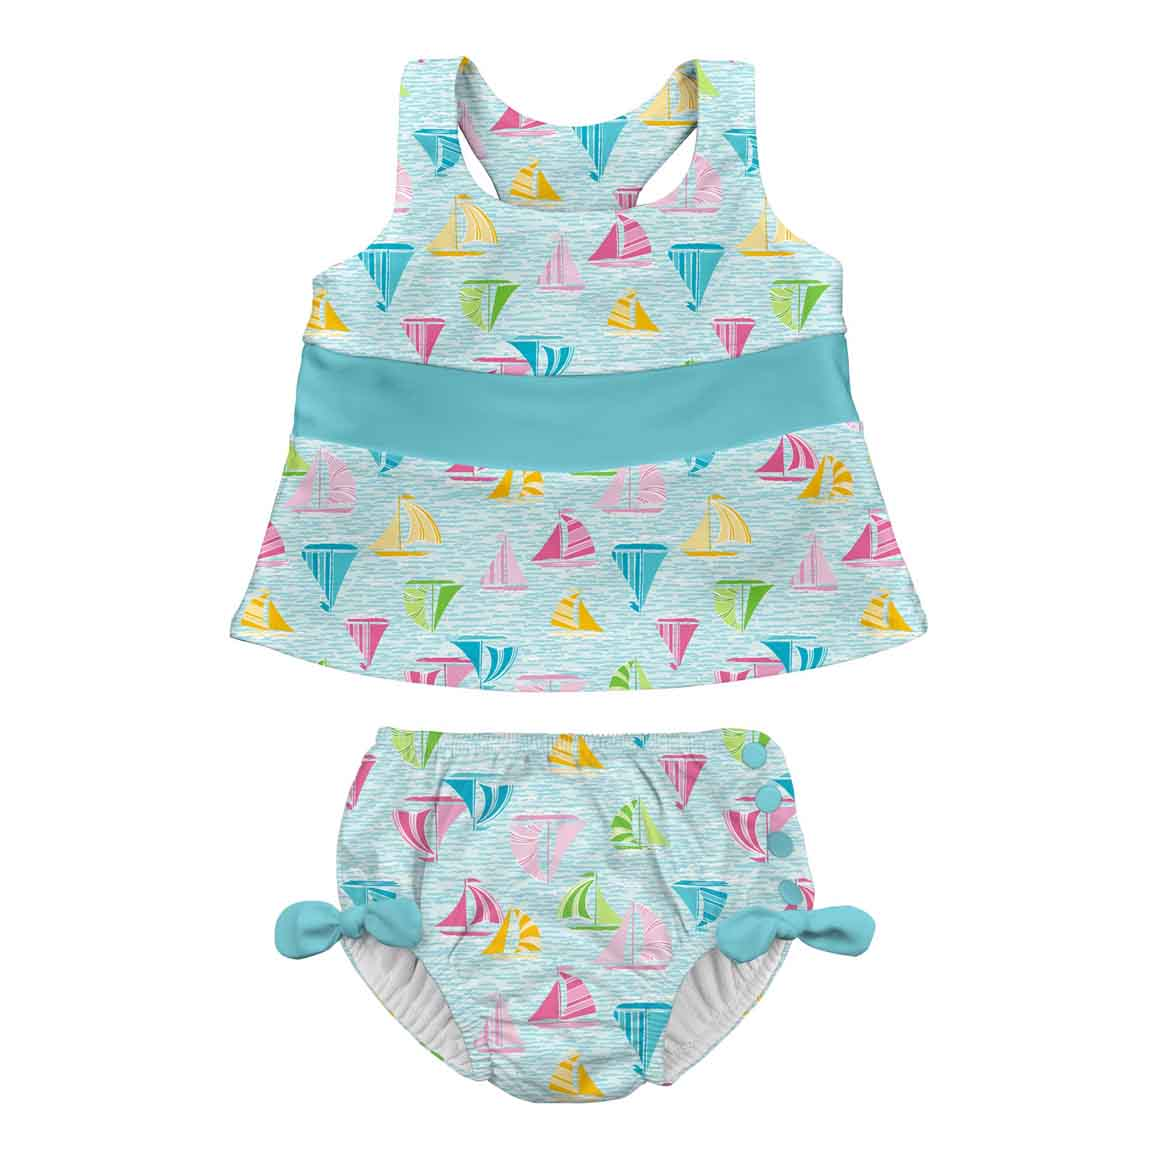 Bow Tankini Swimsuit Set with Snap Reusable Absorbent Swim Diaper-Light Aqua Sailboat Sea | Trada Marketplace